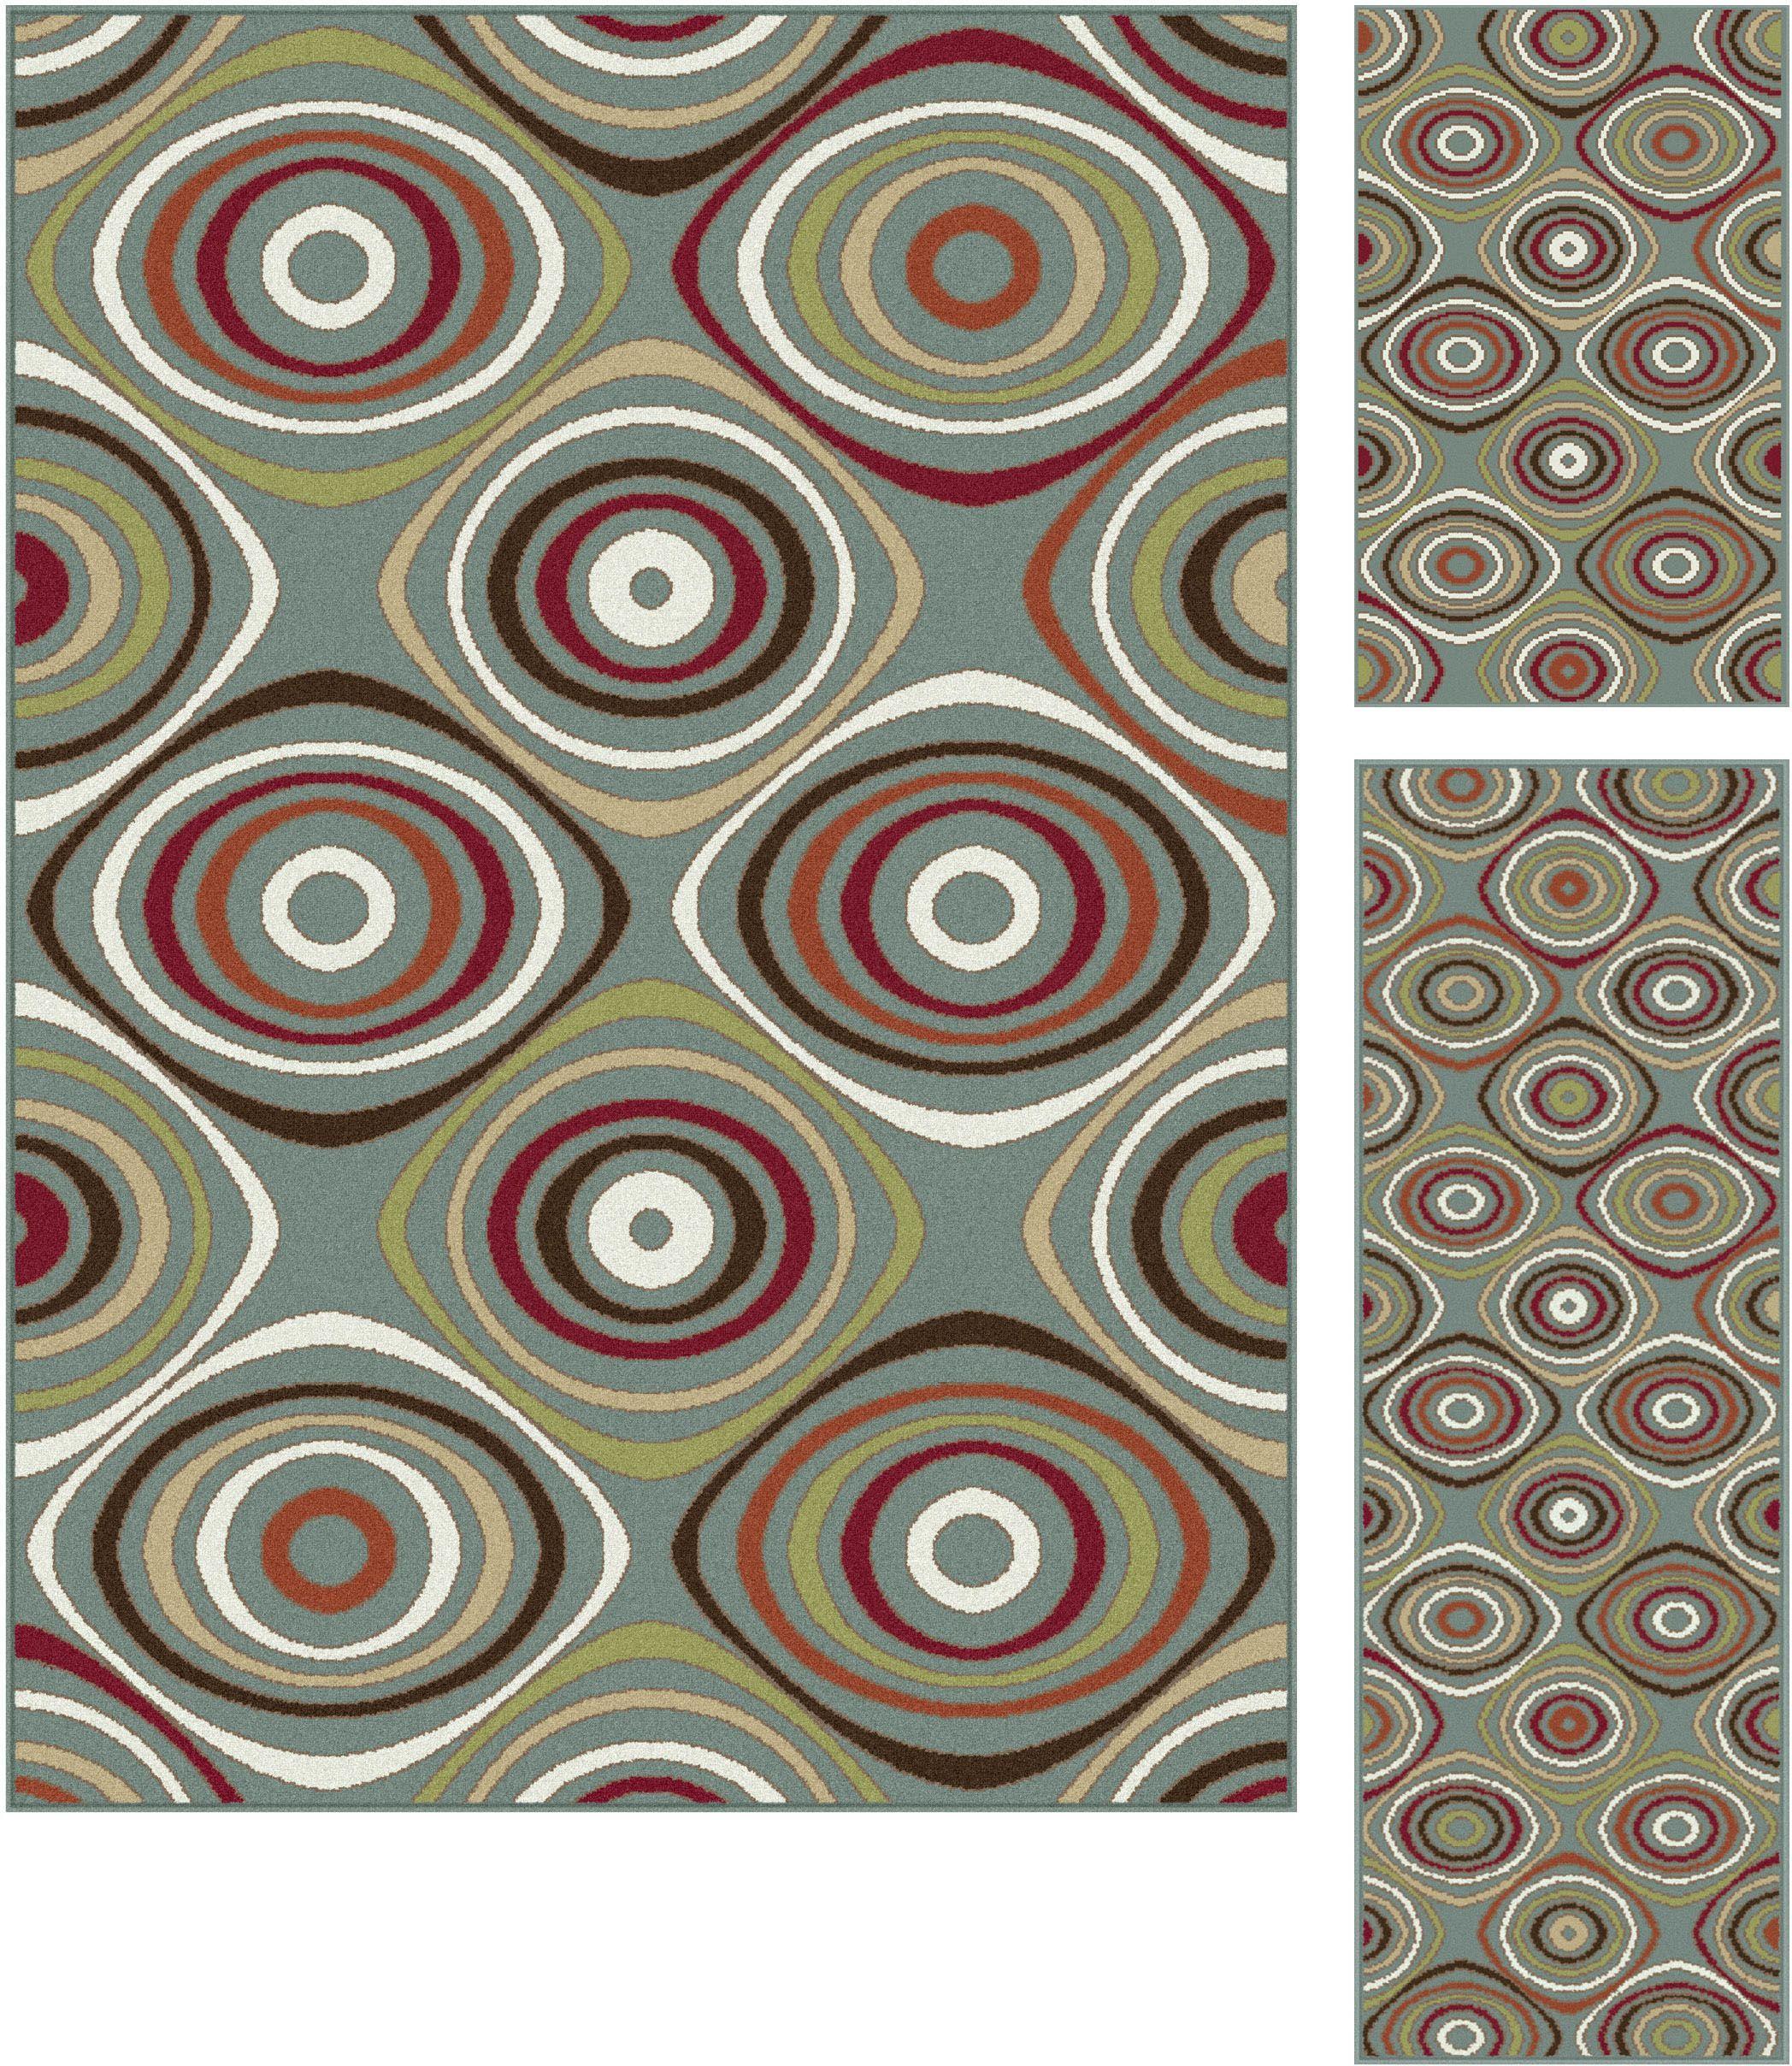 Tayse Rugs Deco Karen 3 Piece Rug Set Transitional Area Rug, B